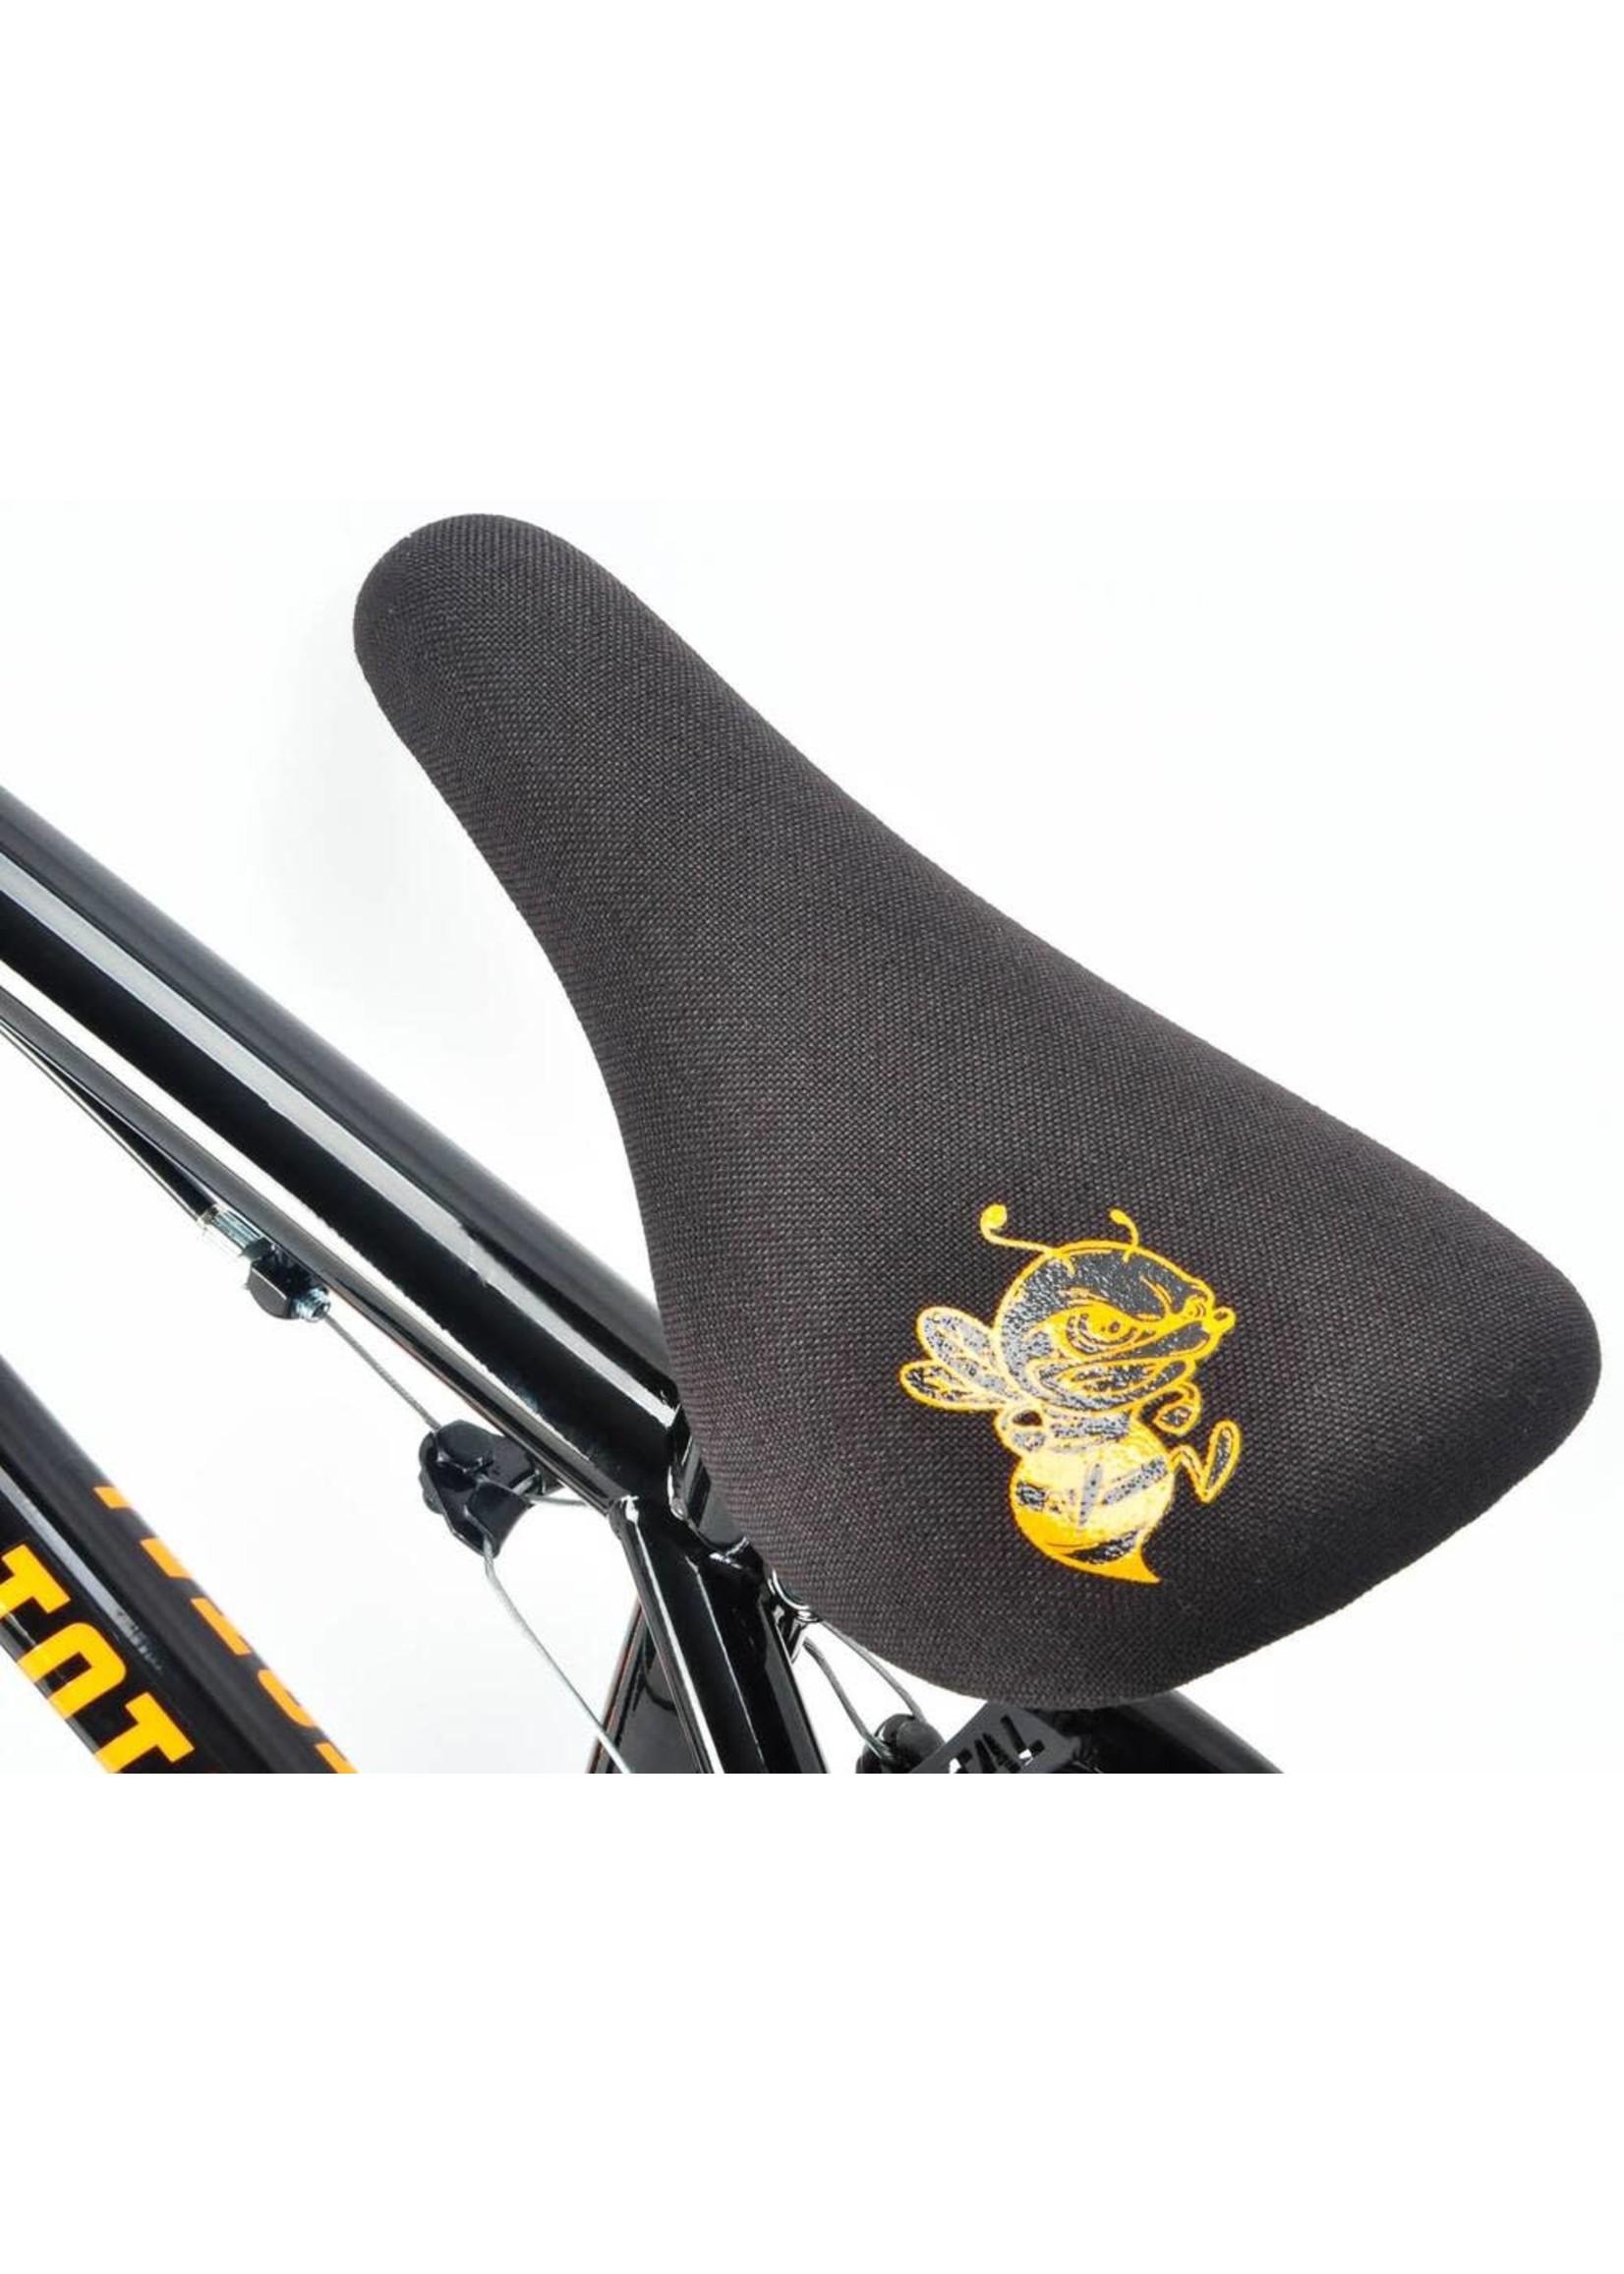 TOTAL KILLABEE BLACK ORANGE BMX